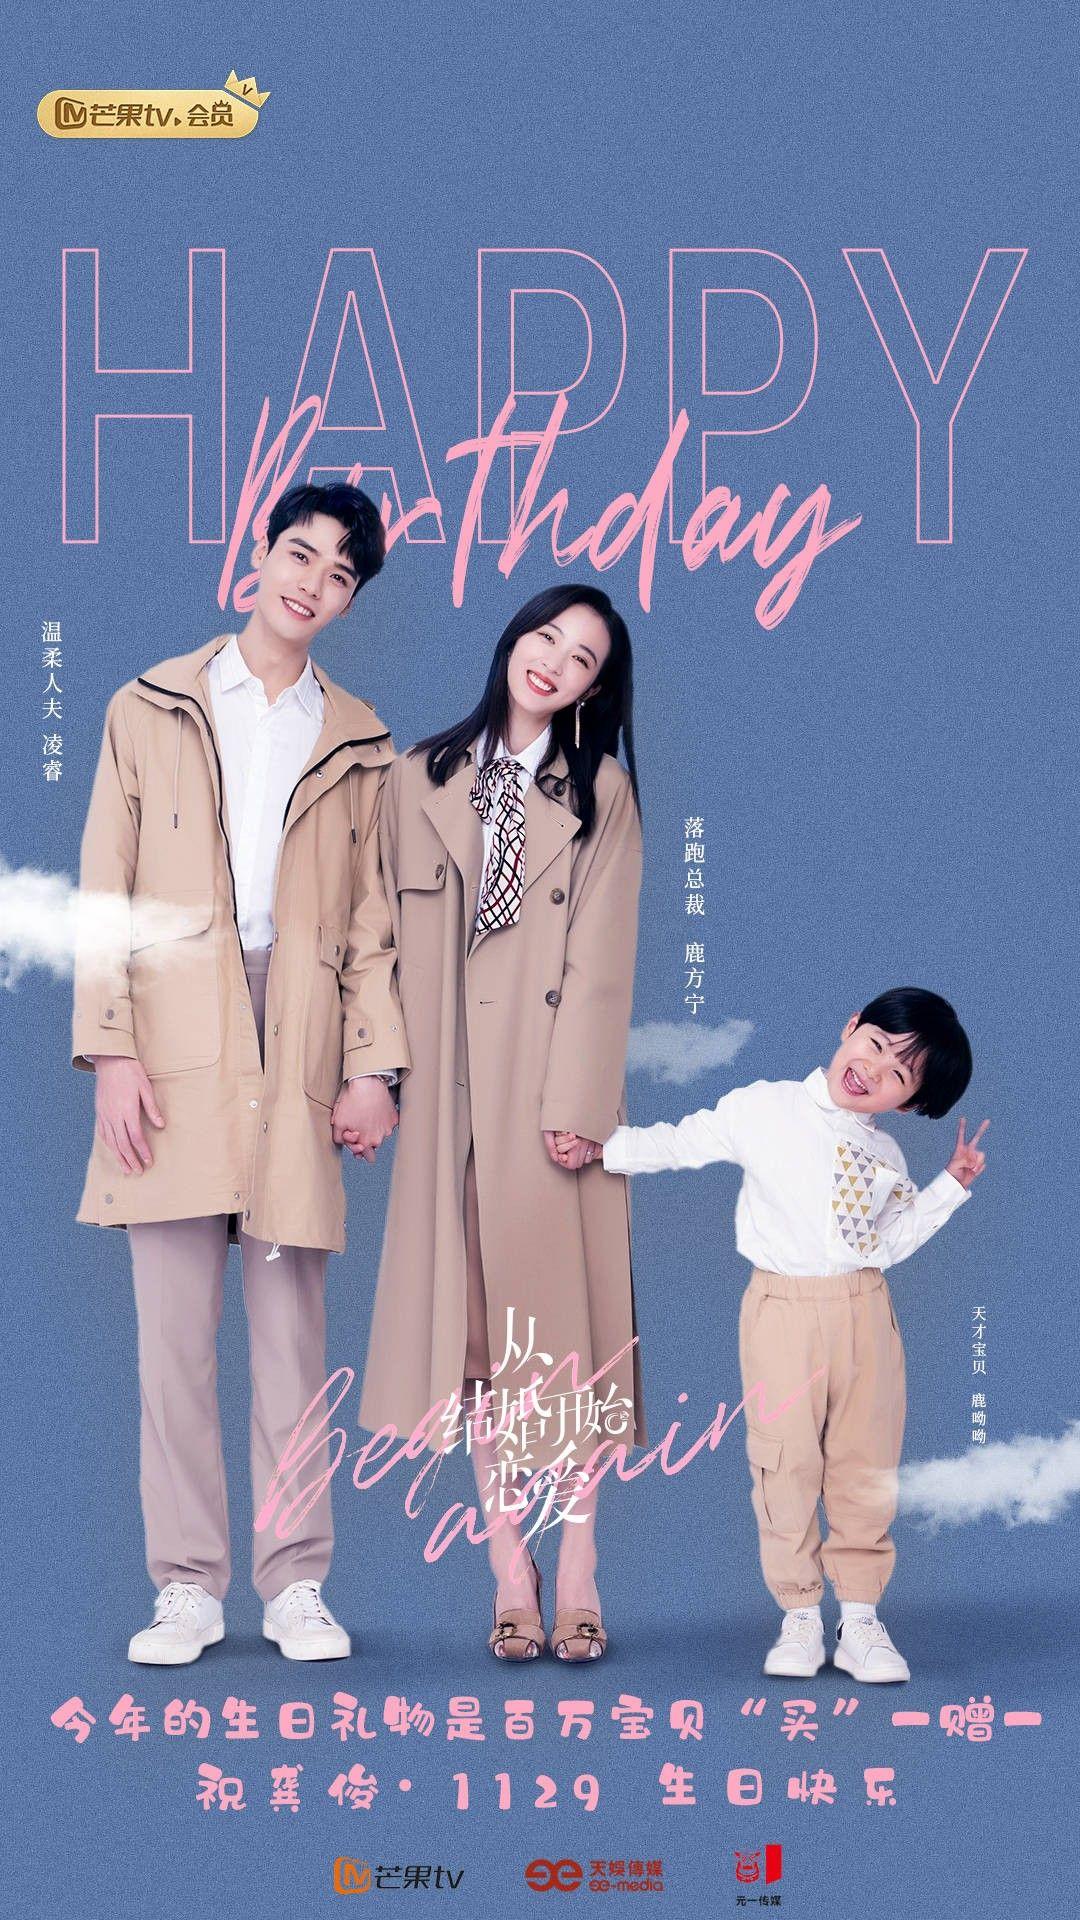 Pin Oleh Raphaella Di Photografy References Di 2021 Selebritas Gadis Korea Menjadi Bahagia